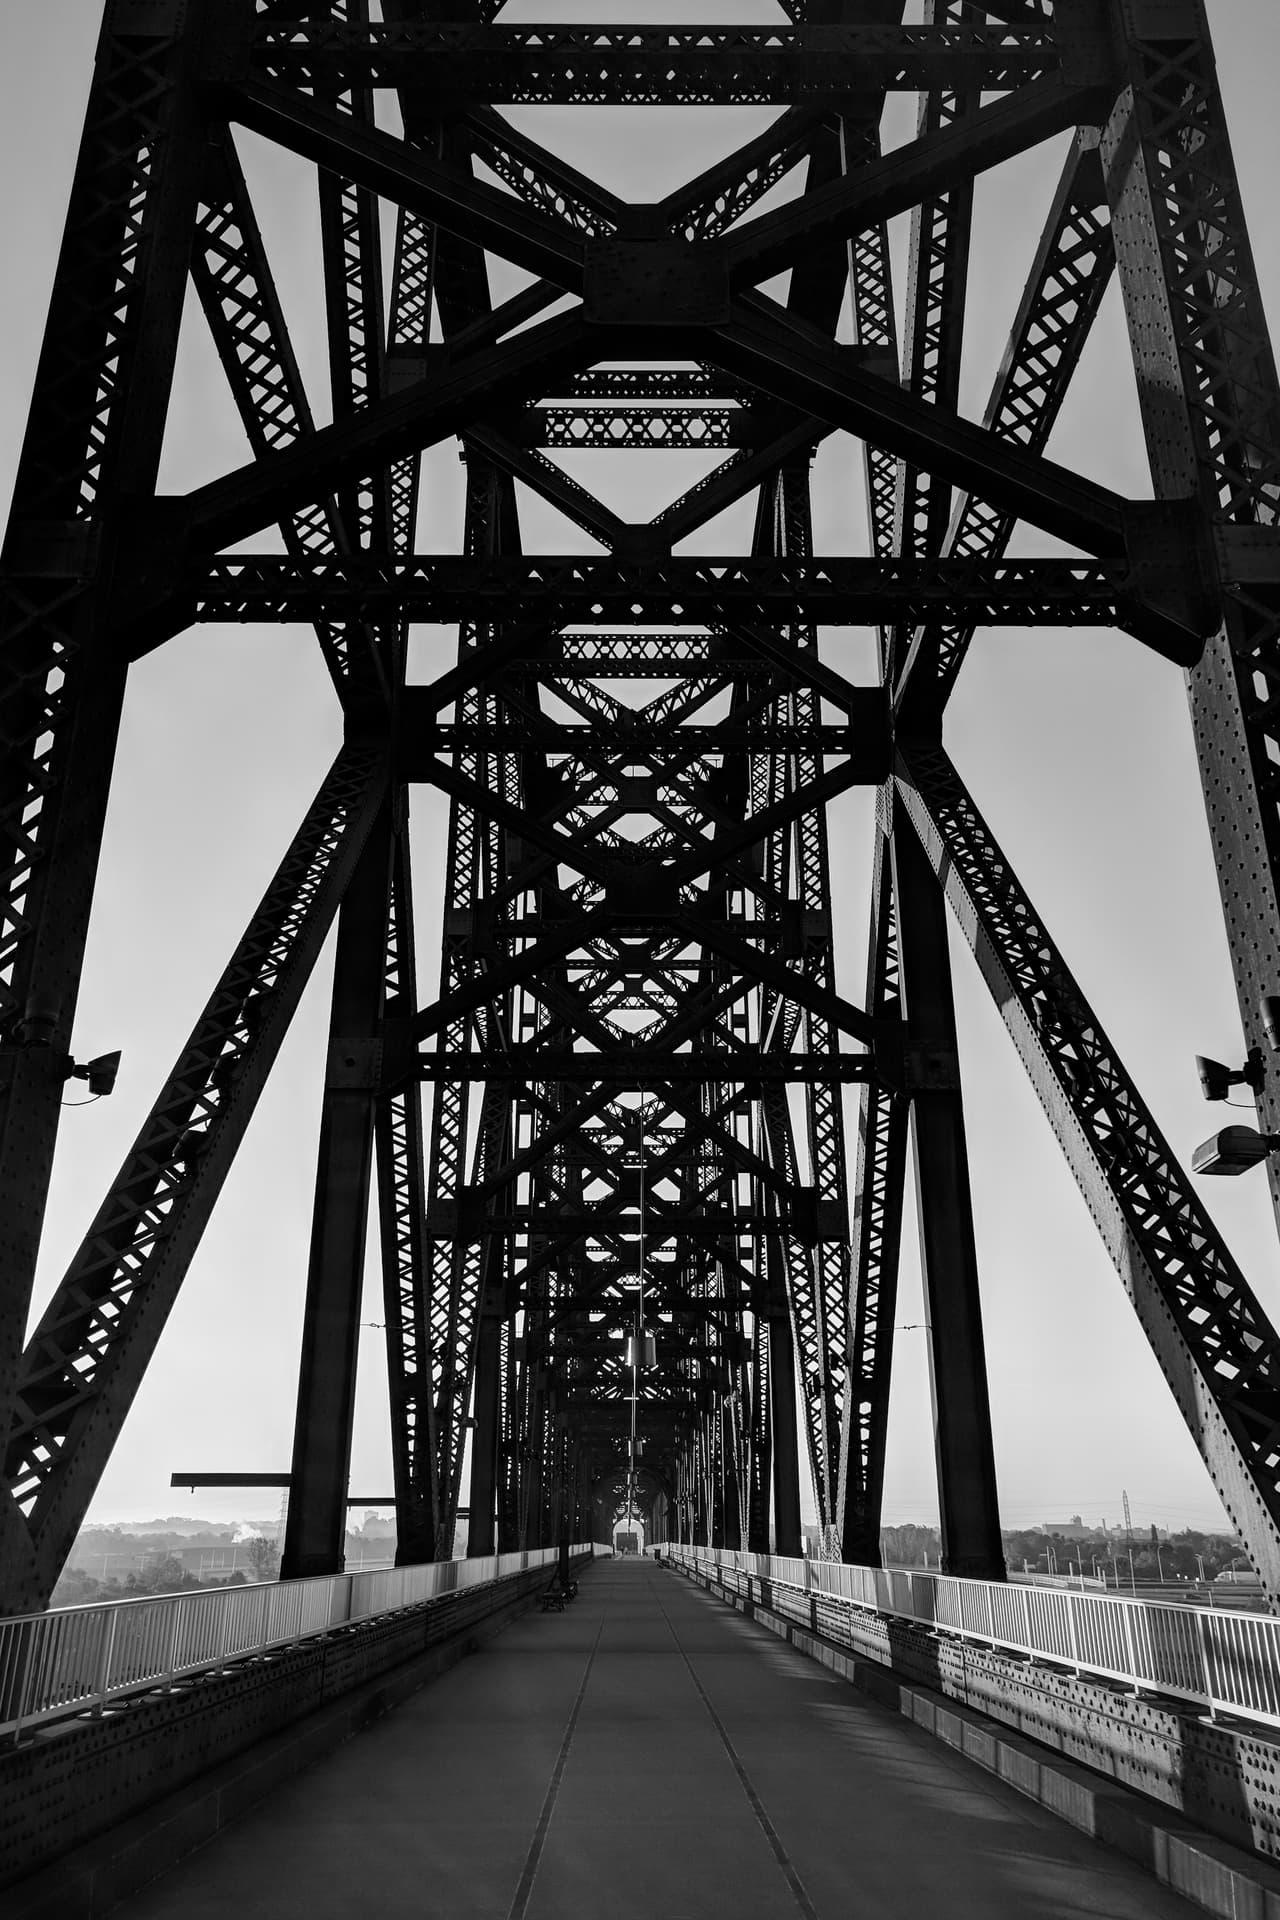 Looking south towards Kentucky along a steel footbridge crossing the Ohio River.